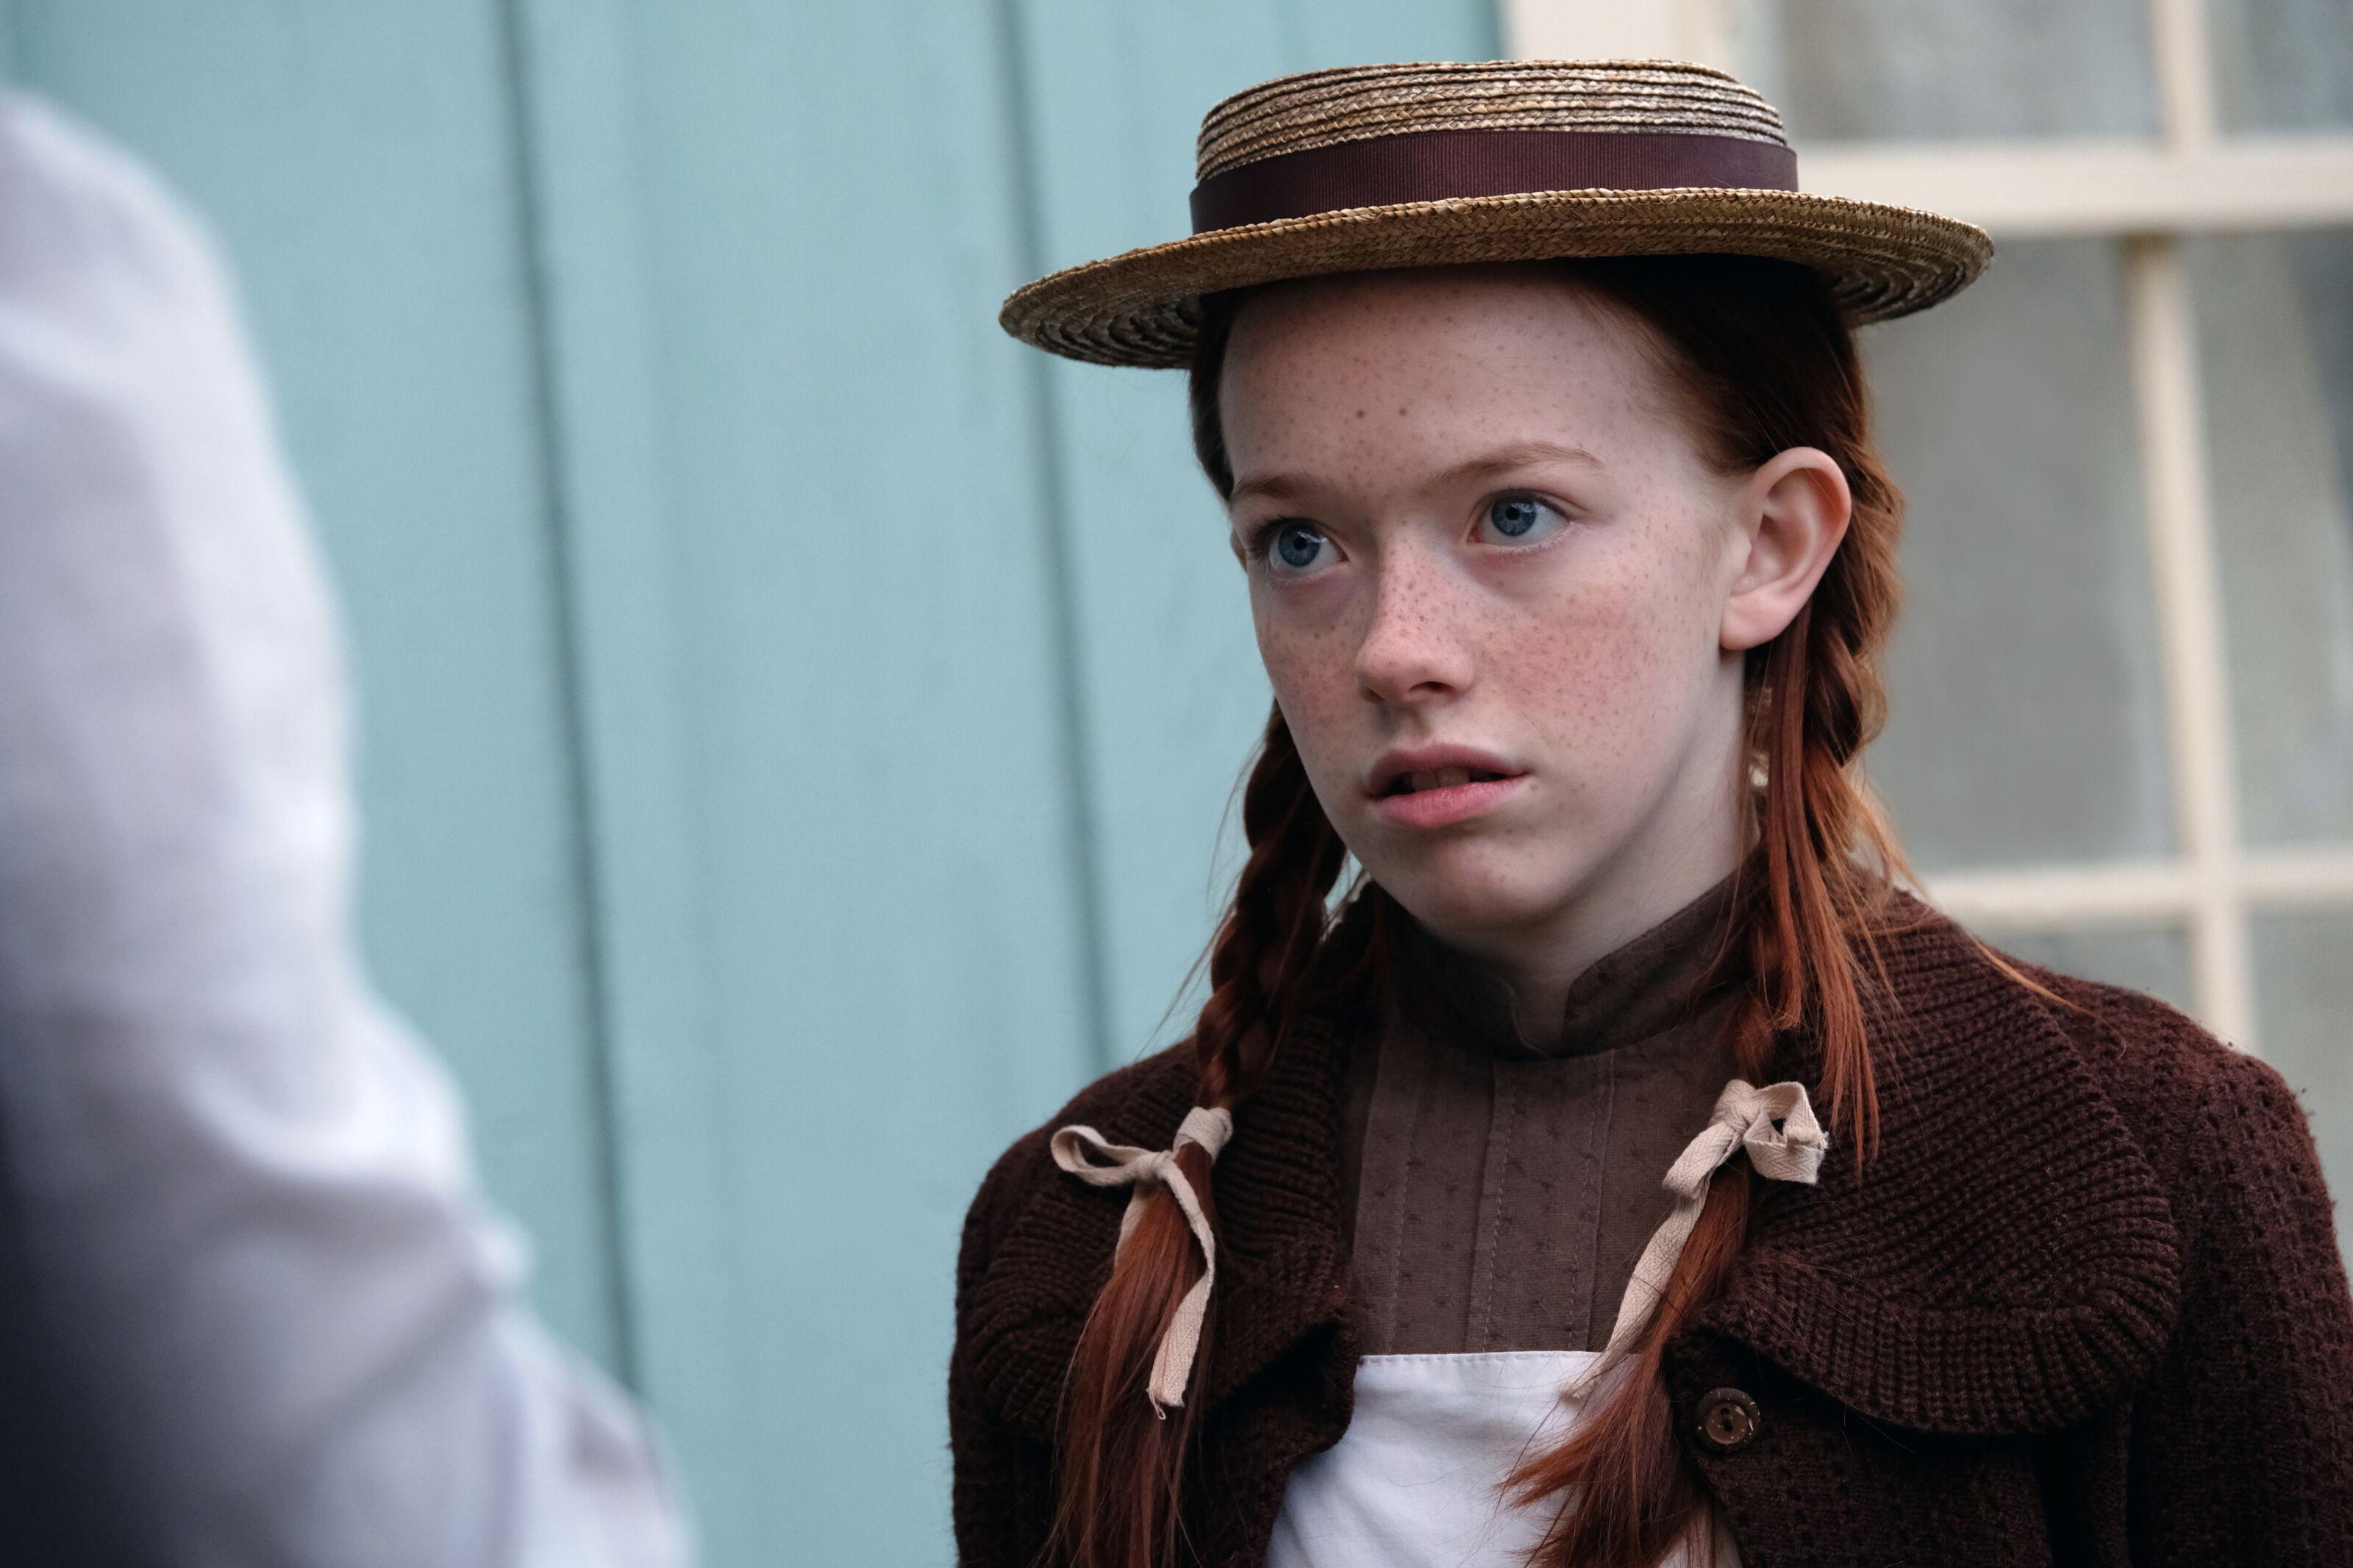 Netflix announces Anne with an E season 3 release date